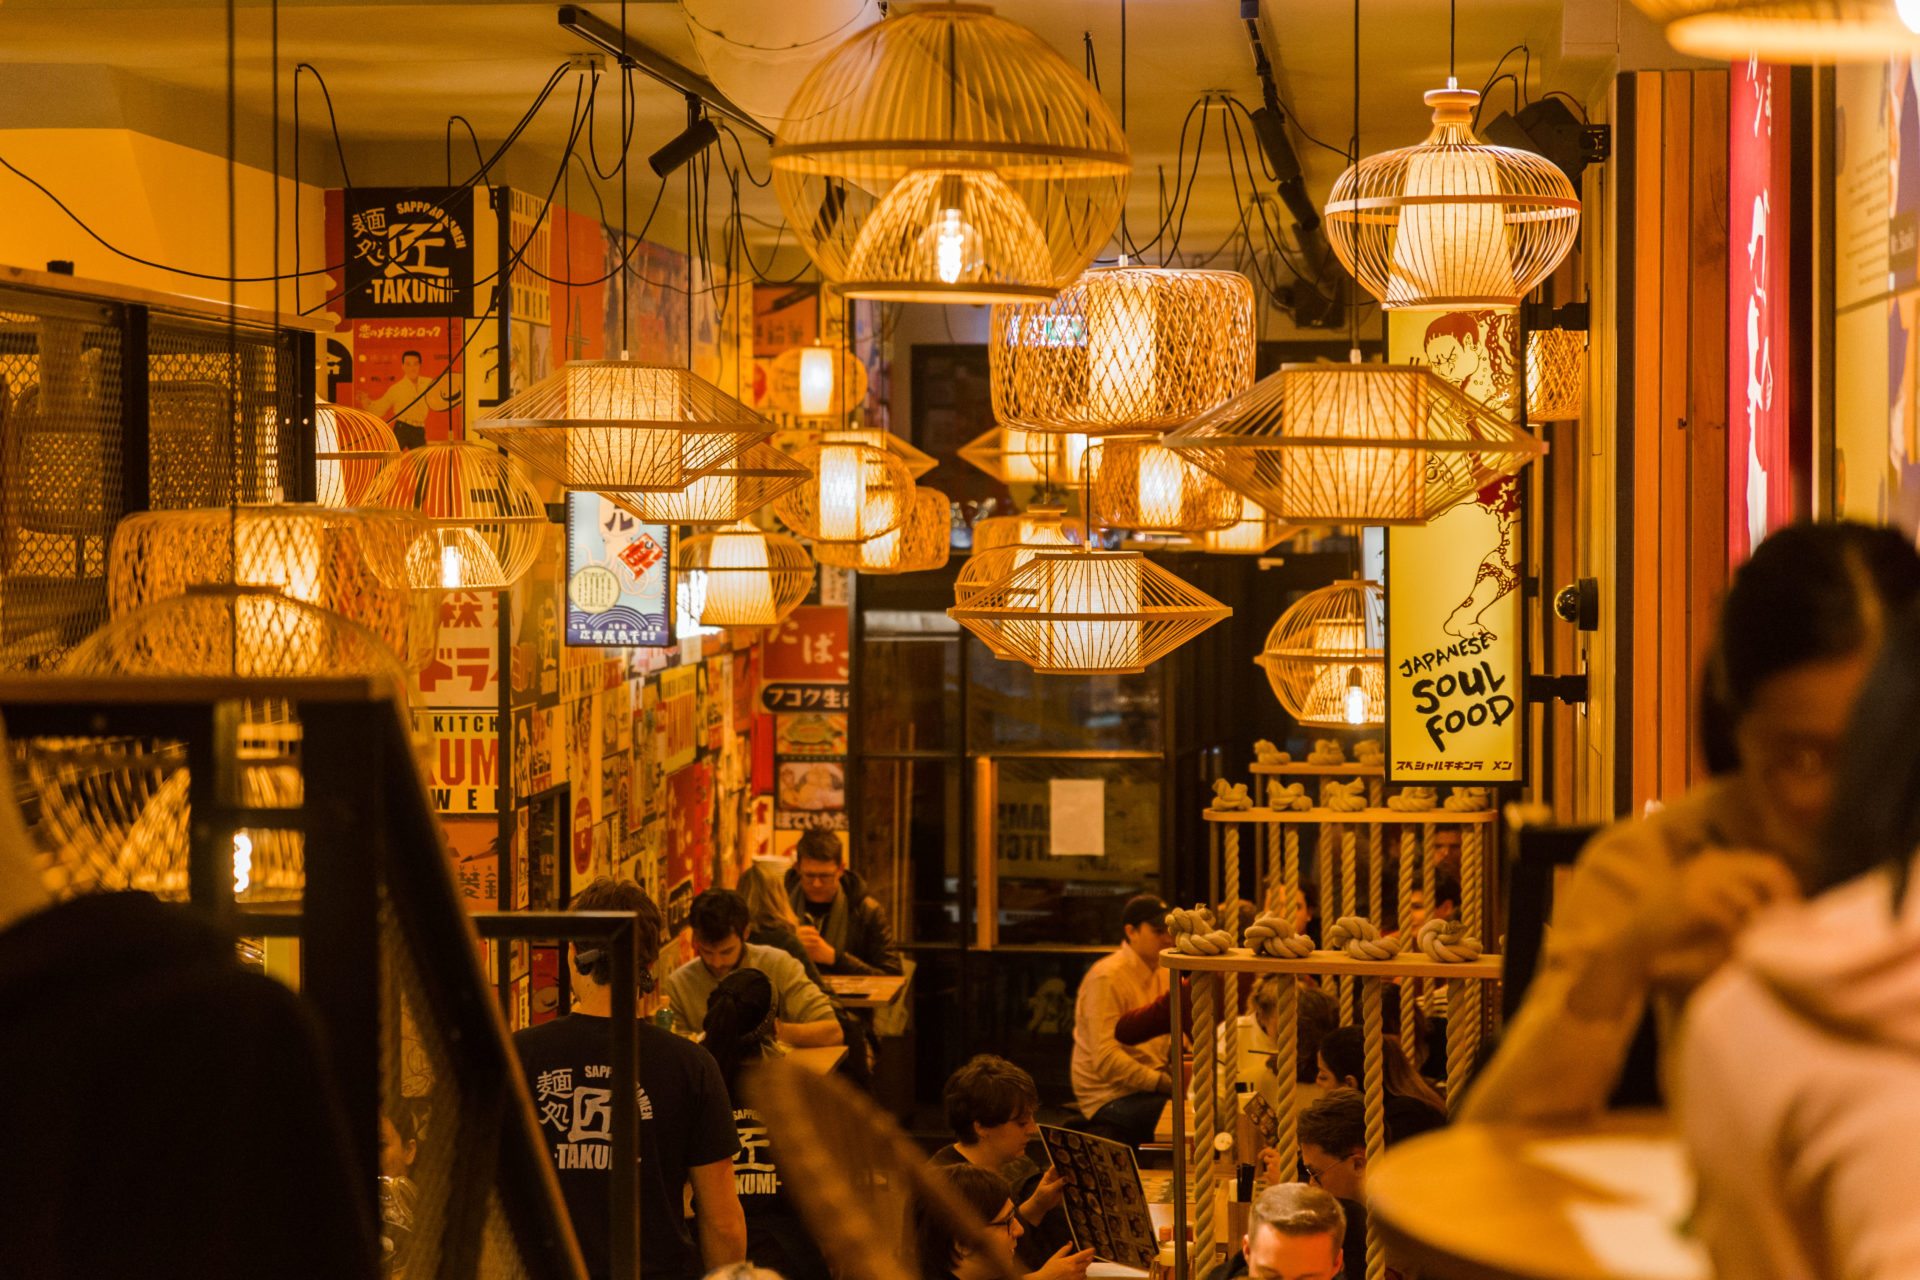 Japanse ramen bij restaurant Takumi Ramen in Antwerpen